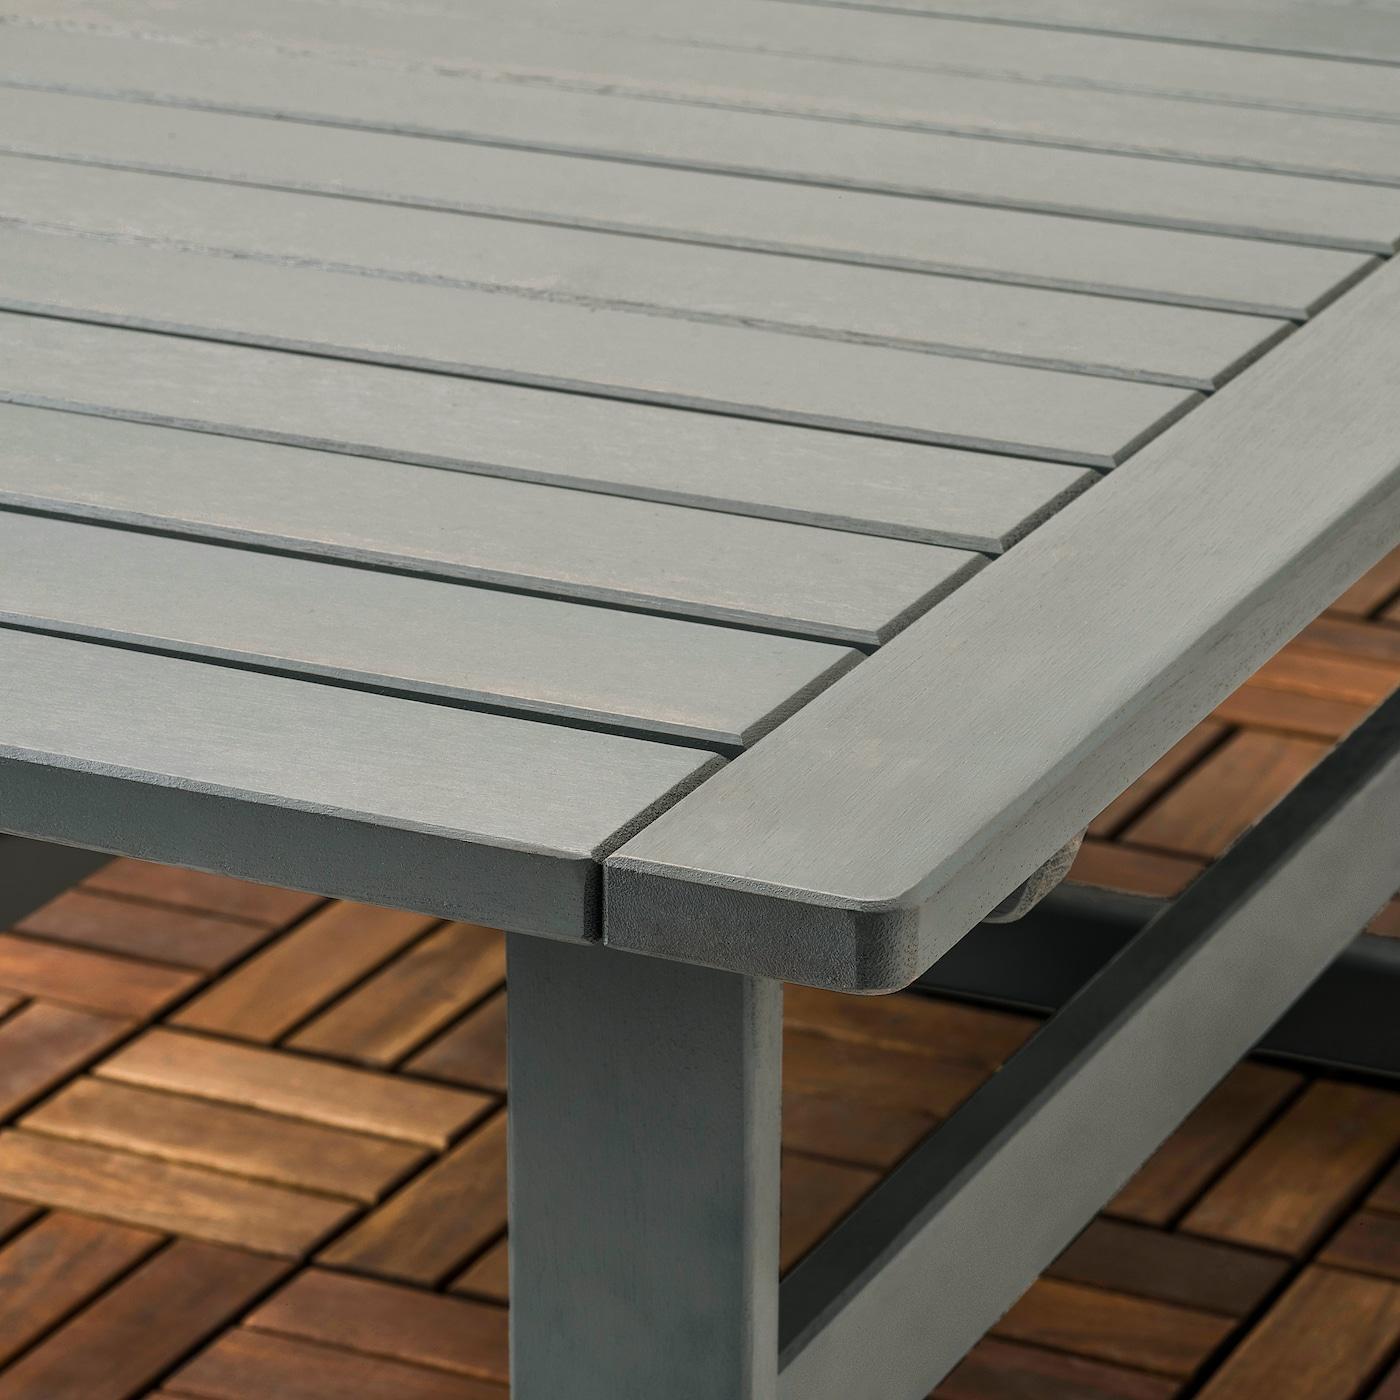 BONDHOLMEN 4-seat conversation set, outdoor, gray stained/Frösön/Duvholmen blue